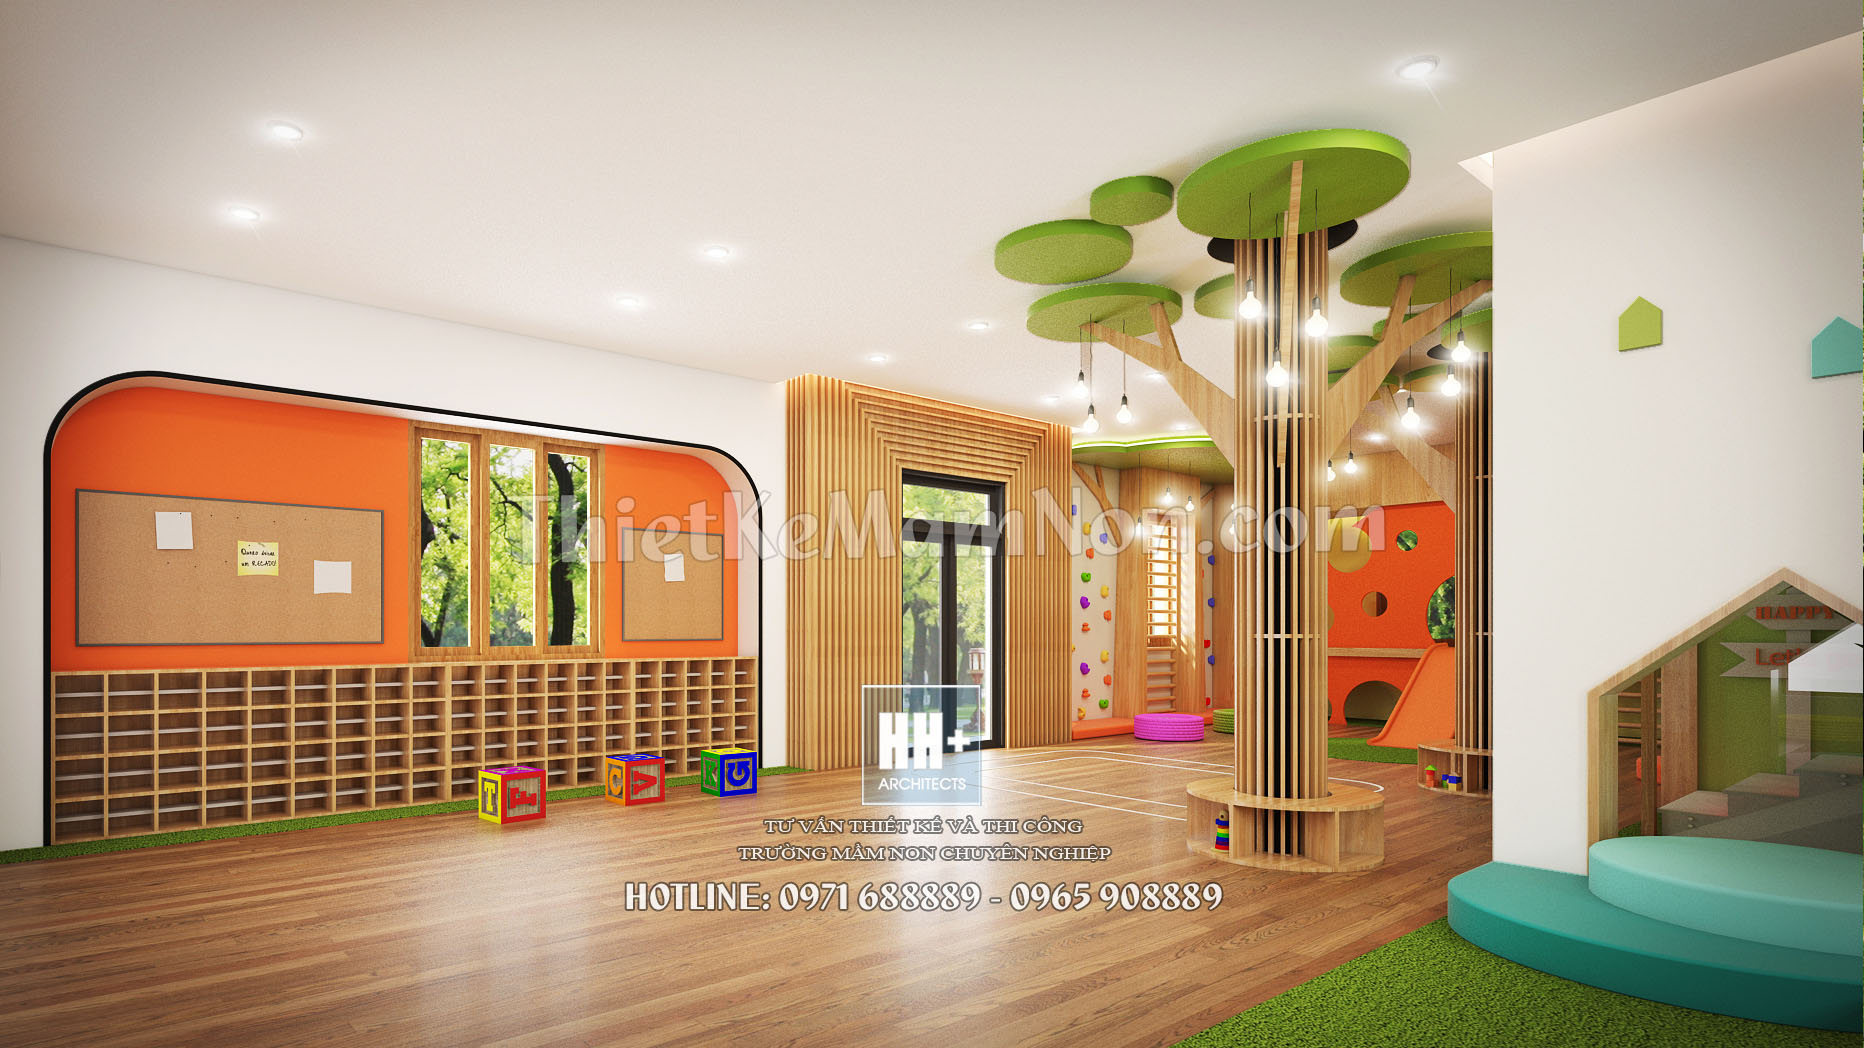 4 thiết kế trường mầm non montessori Thiết kế trường mầm non montessori Việt Anh 4 1